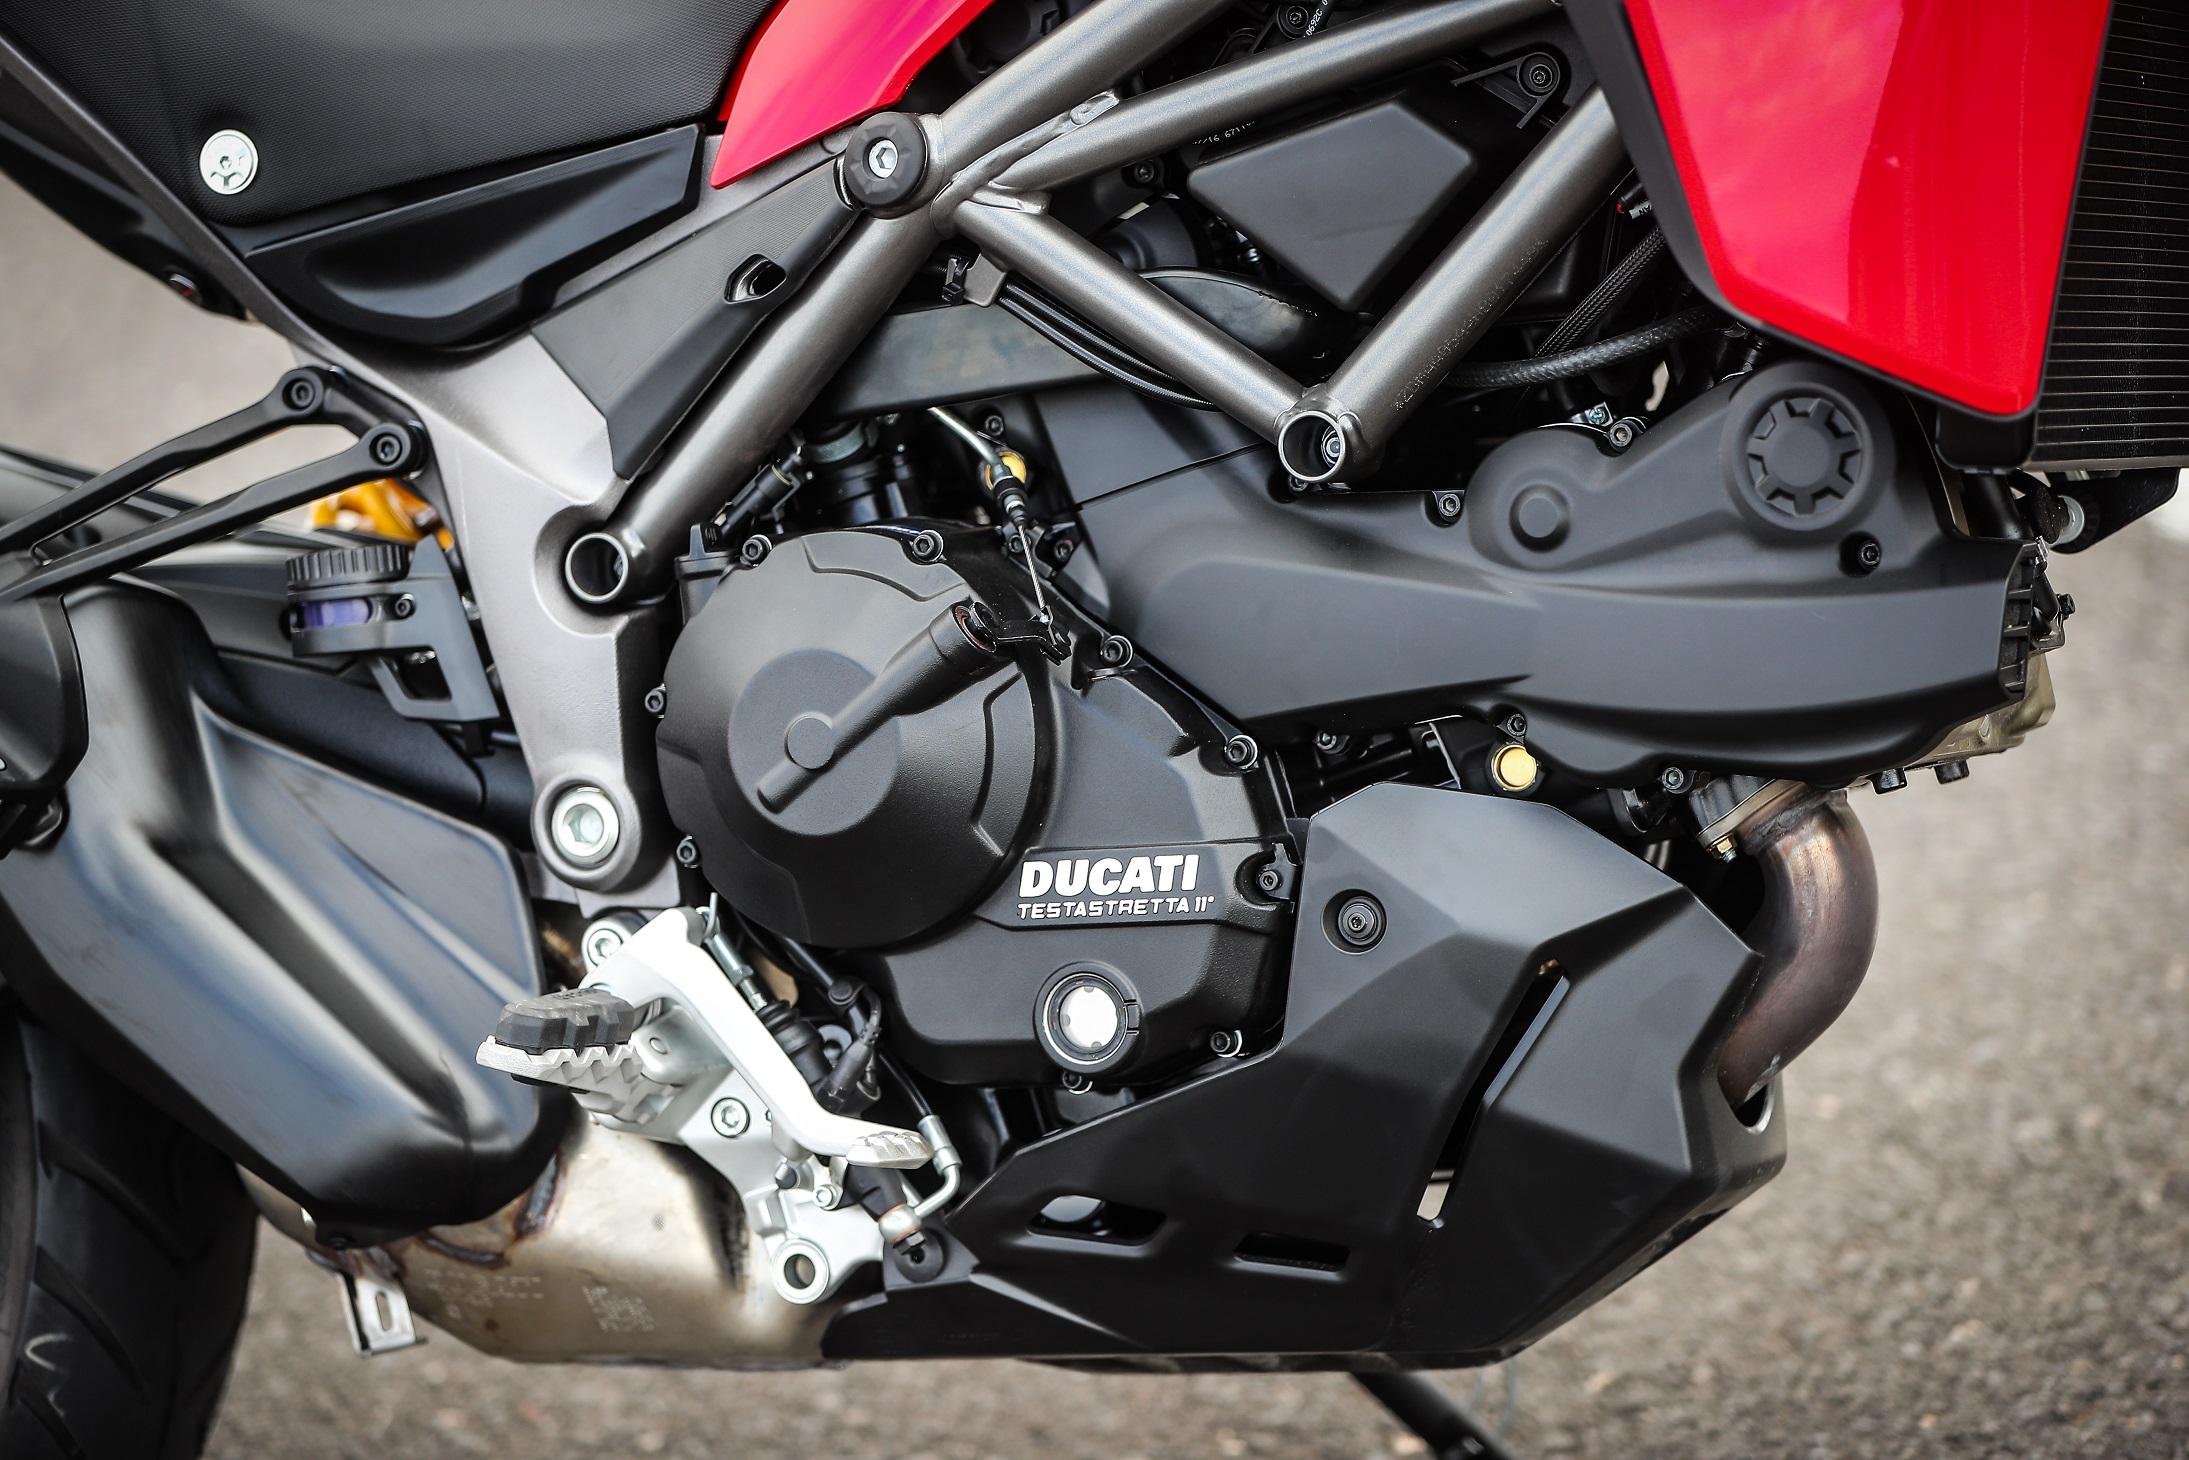 Ducati Multistrada 950 engine